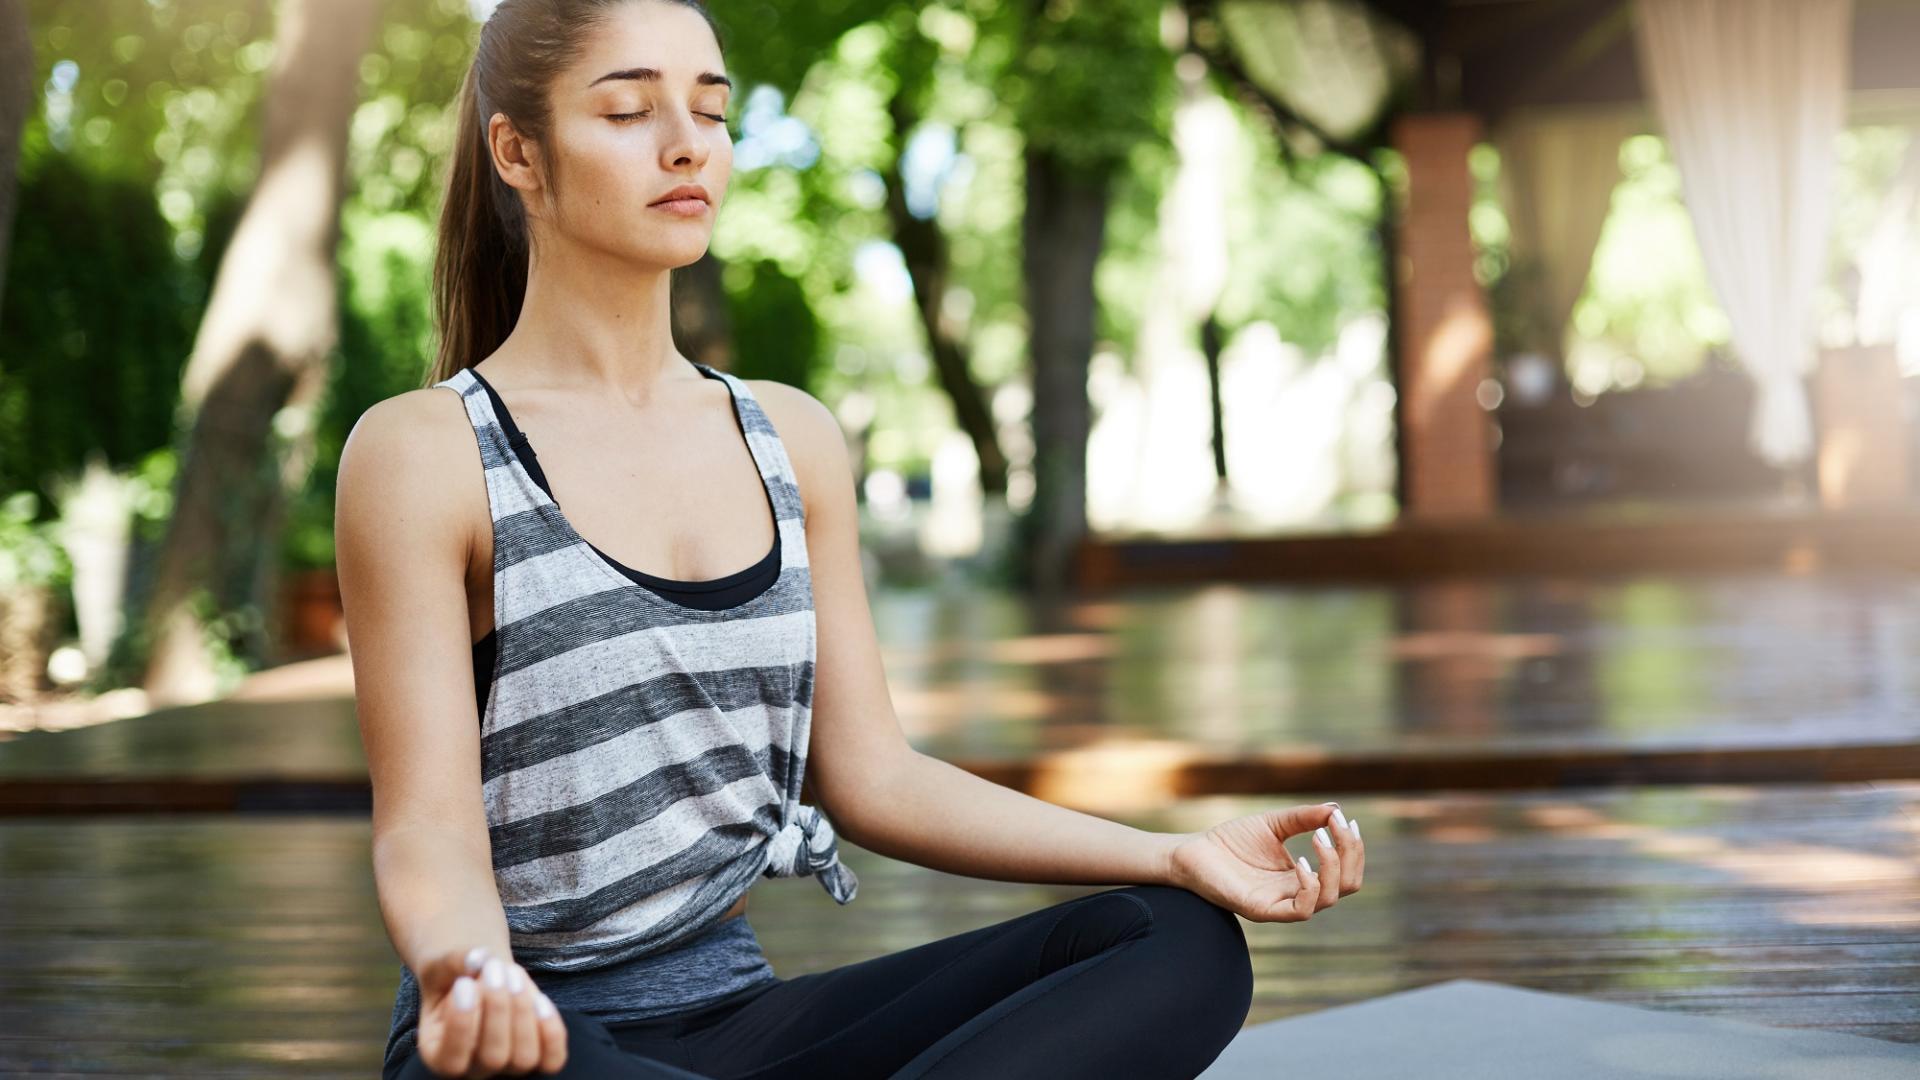 Frau Yoga Atmen